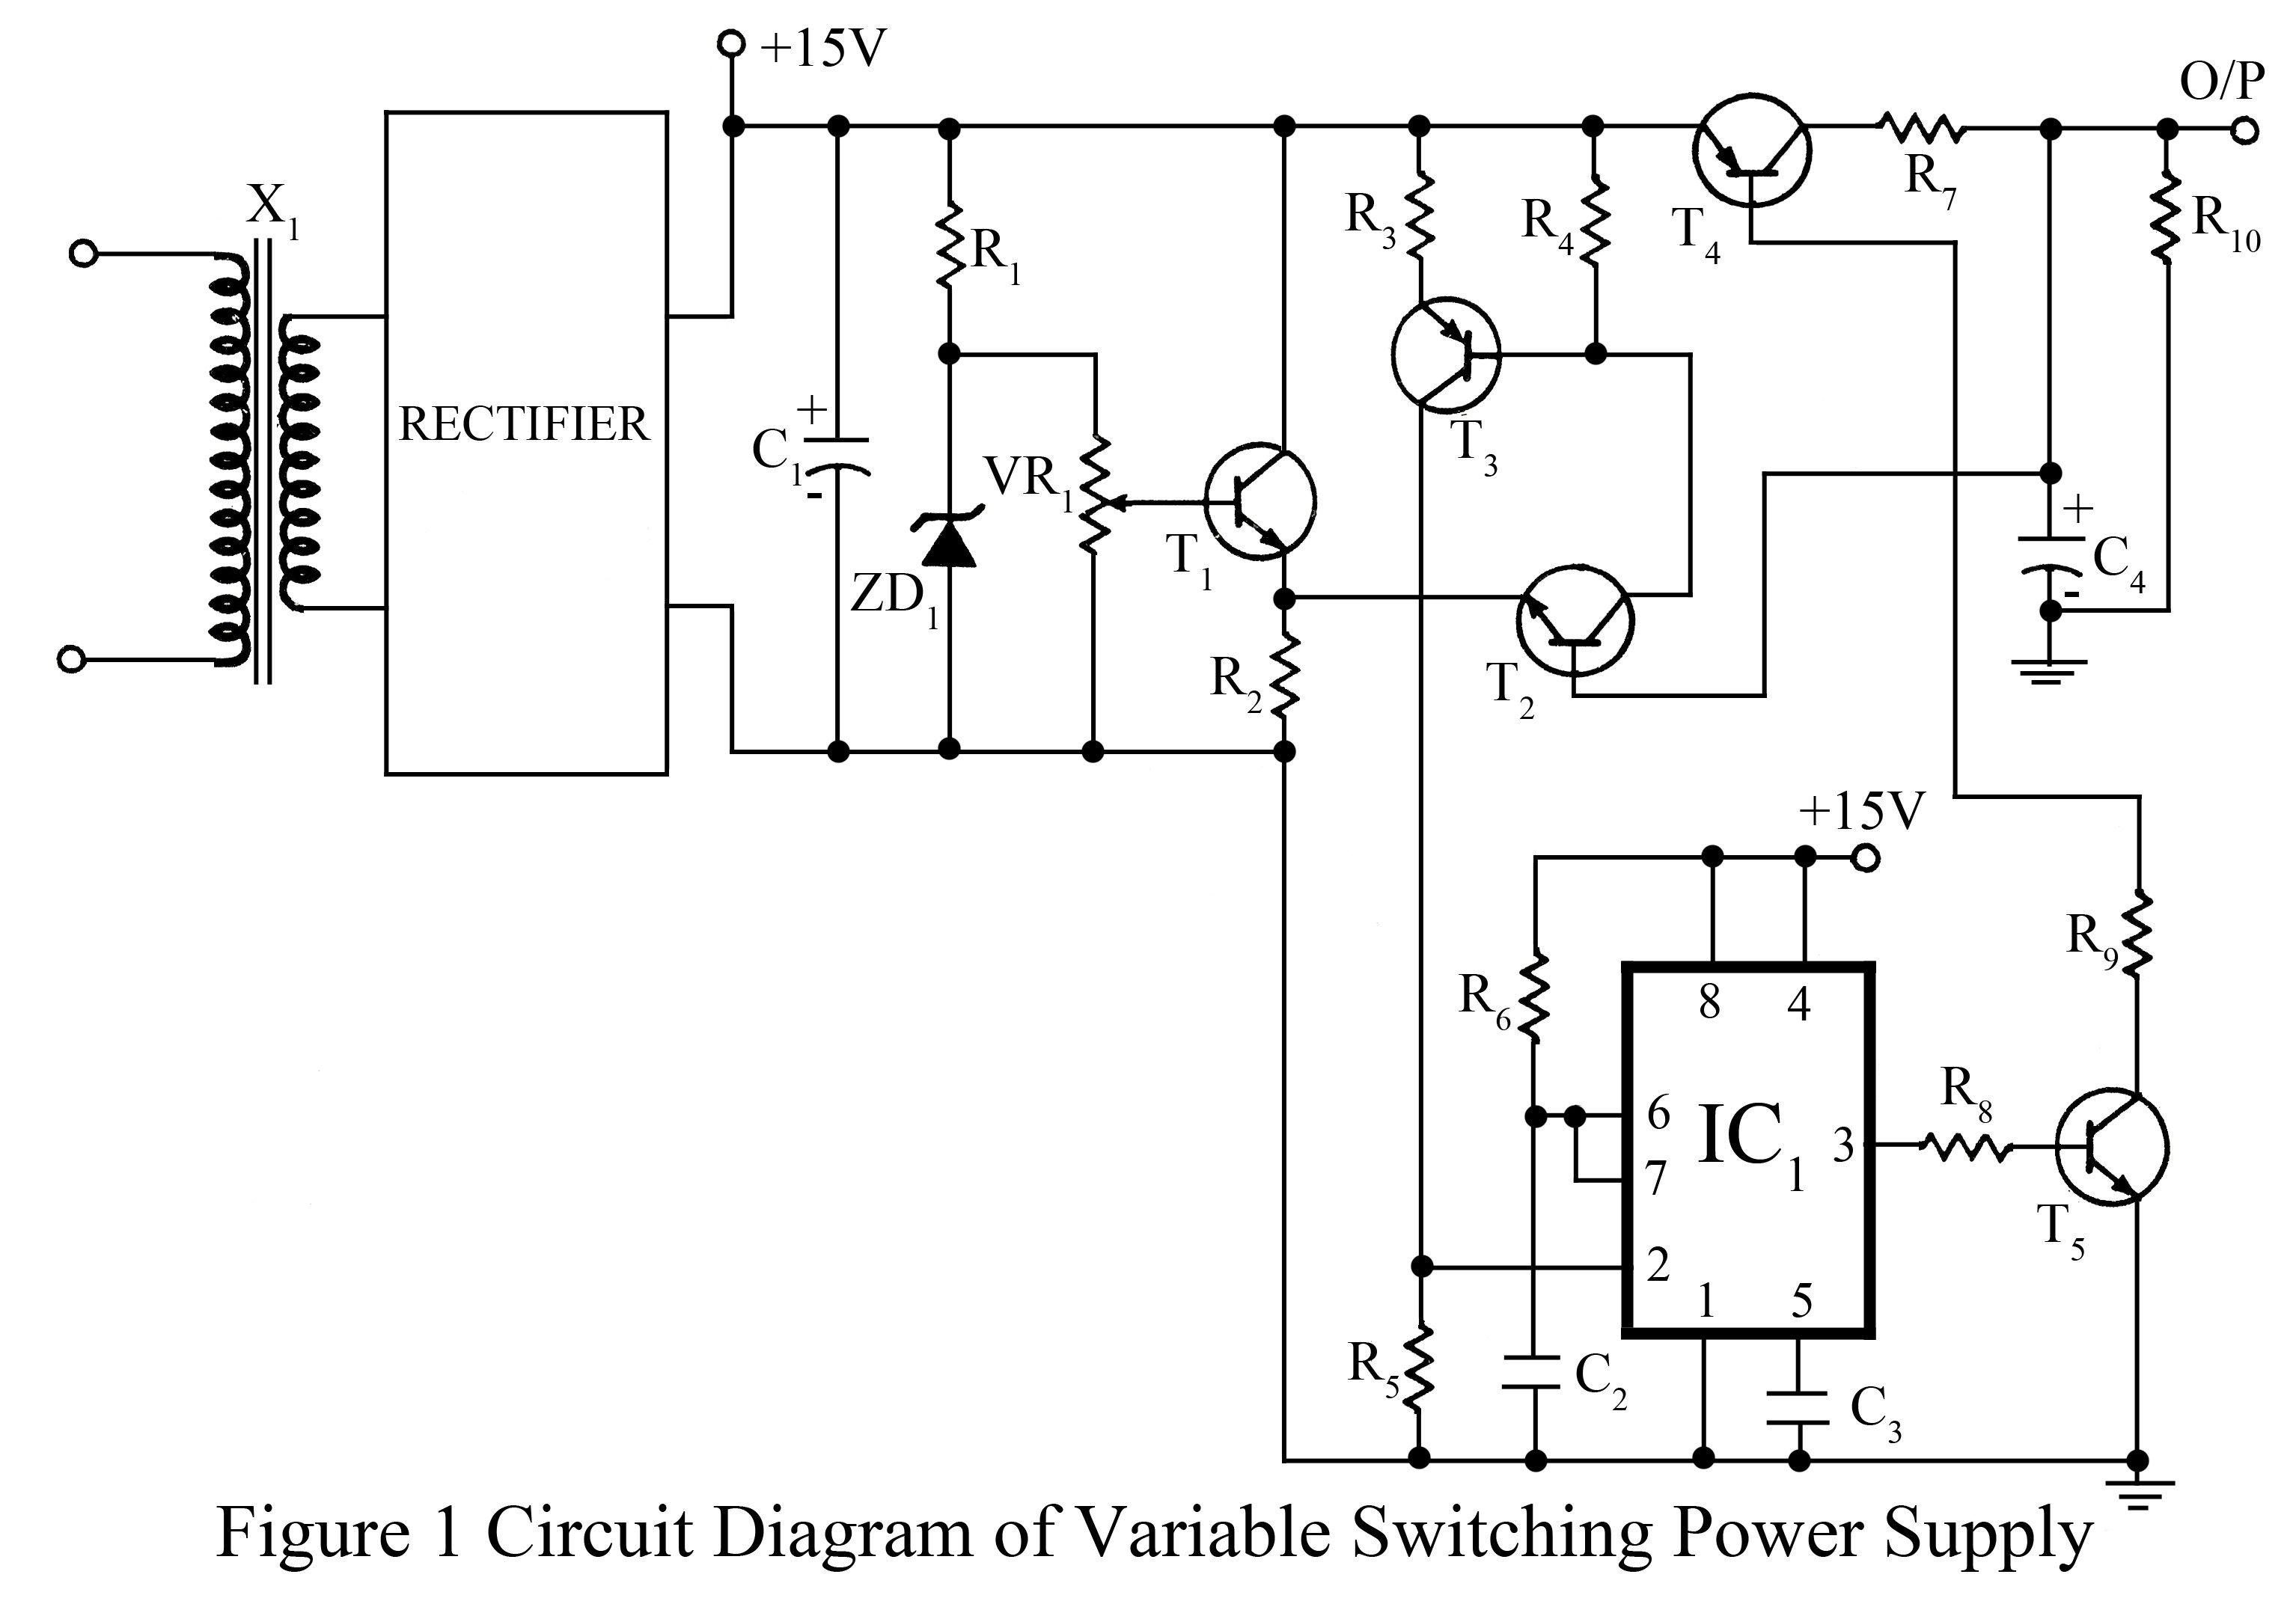 Wiring Diagram Student